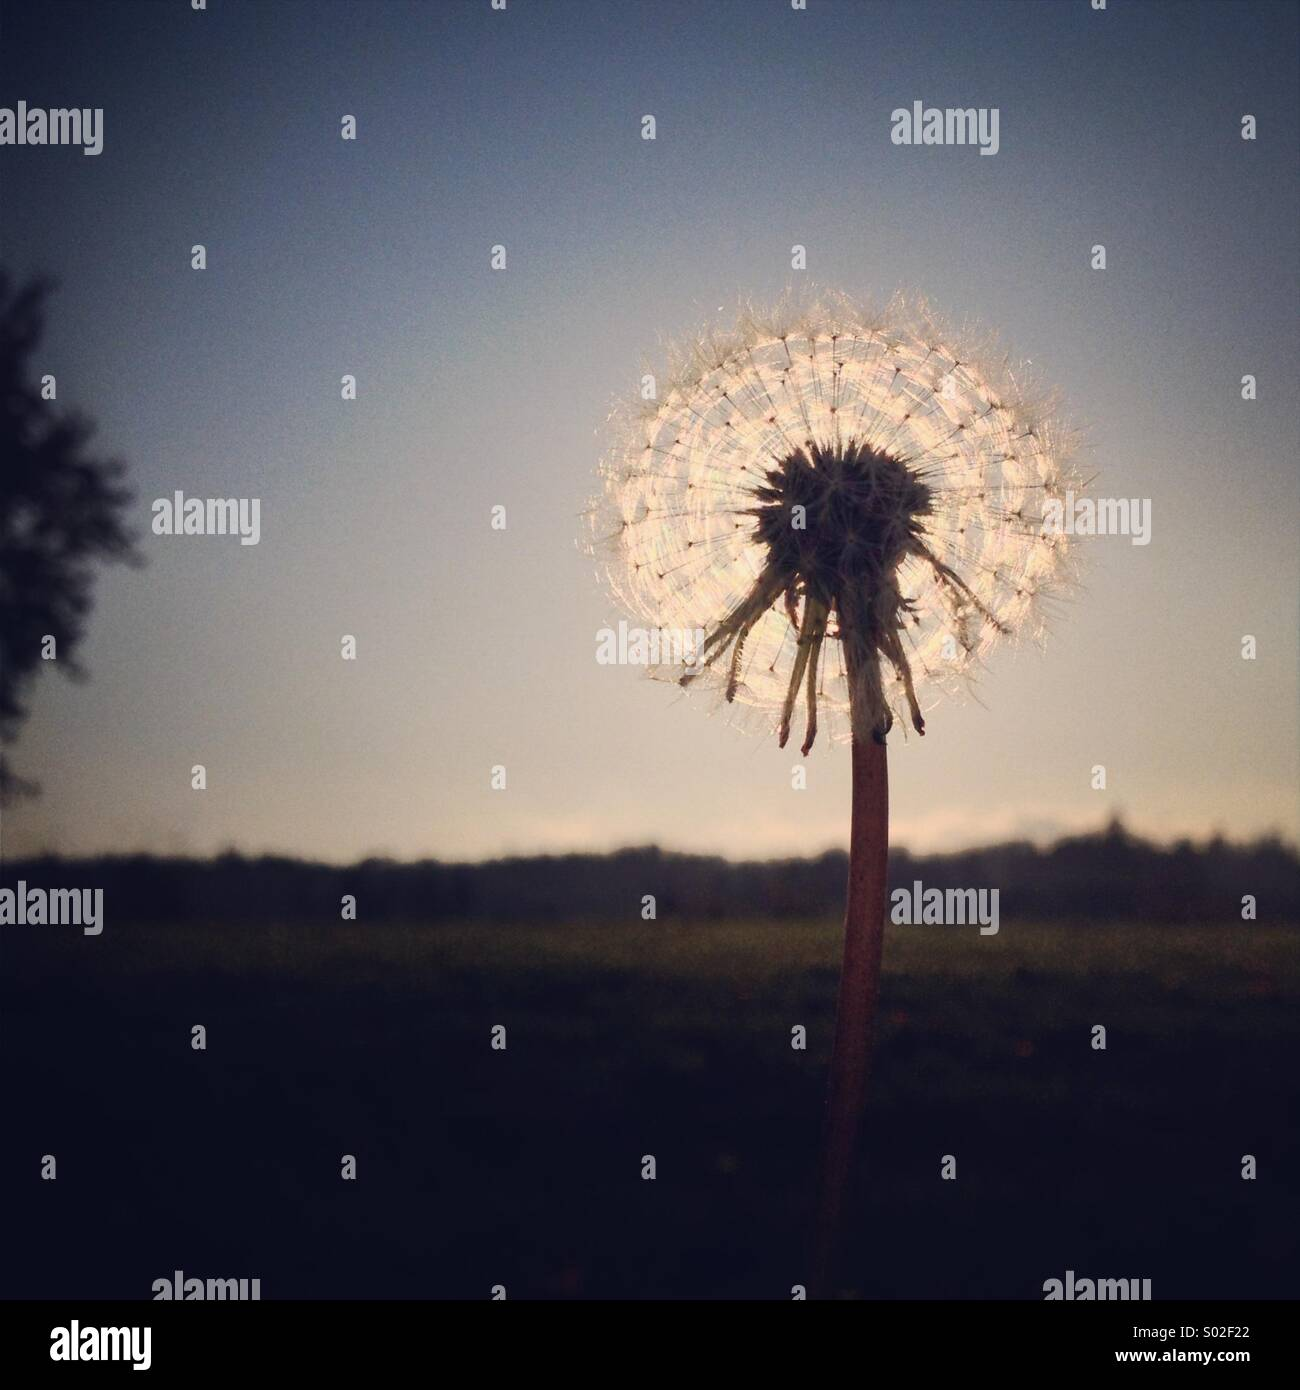 Dandelion Sunset - Stock Image